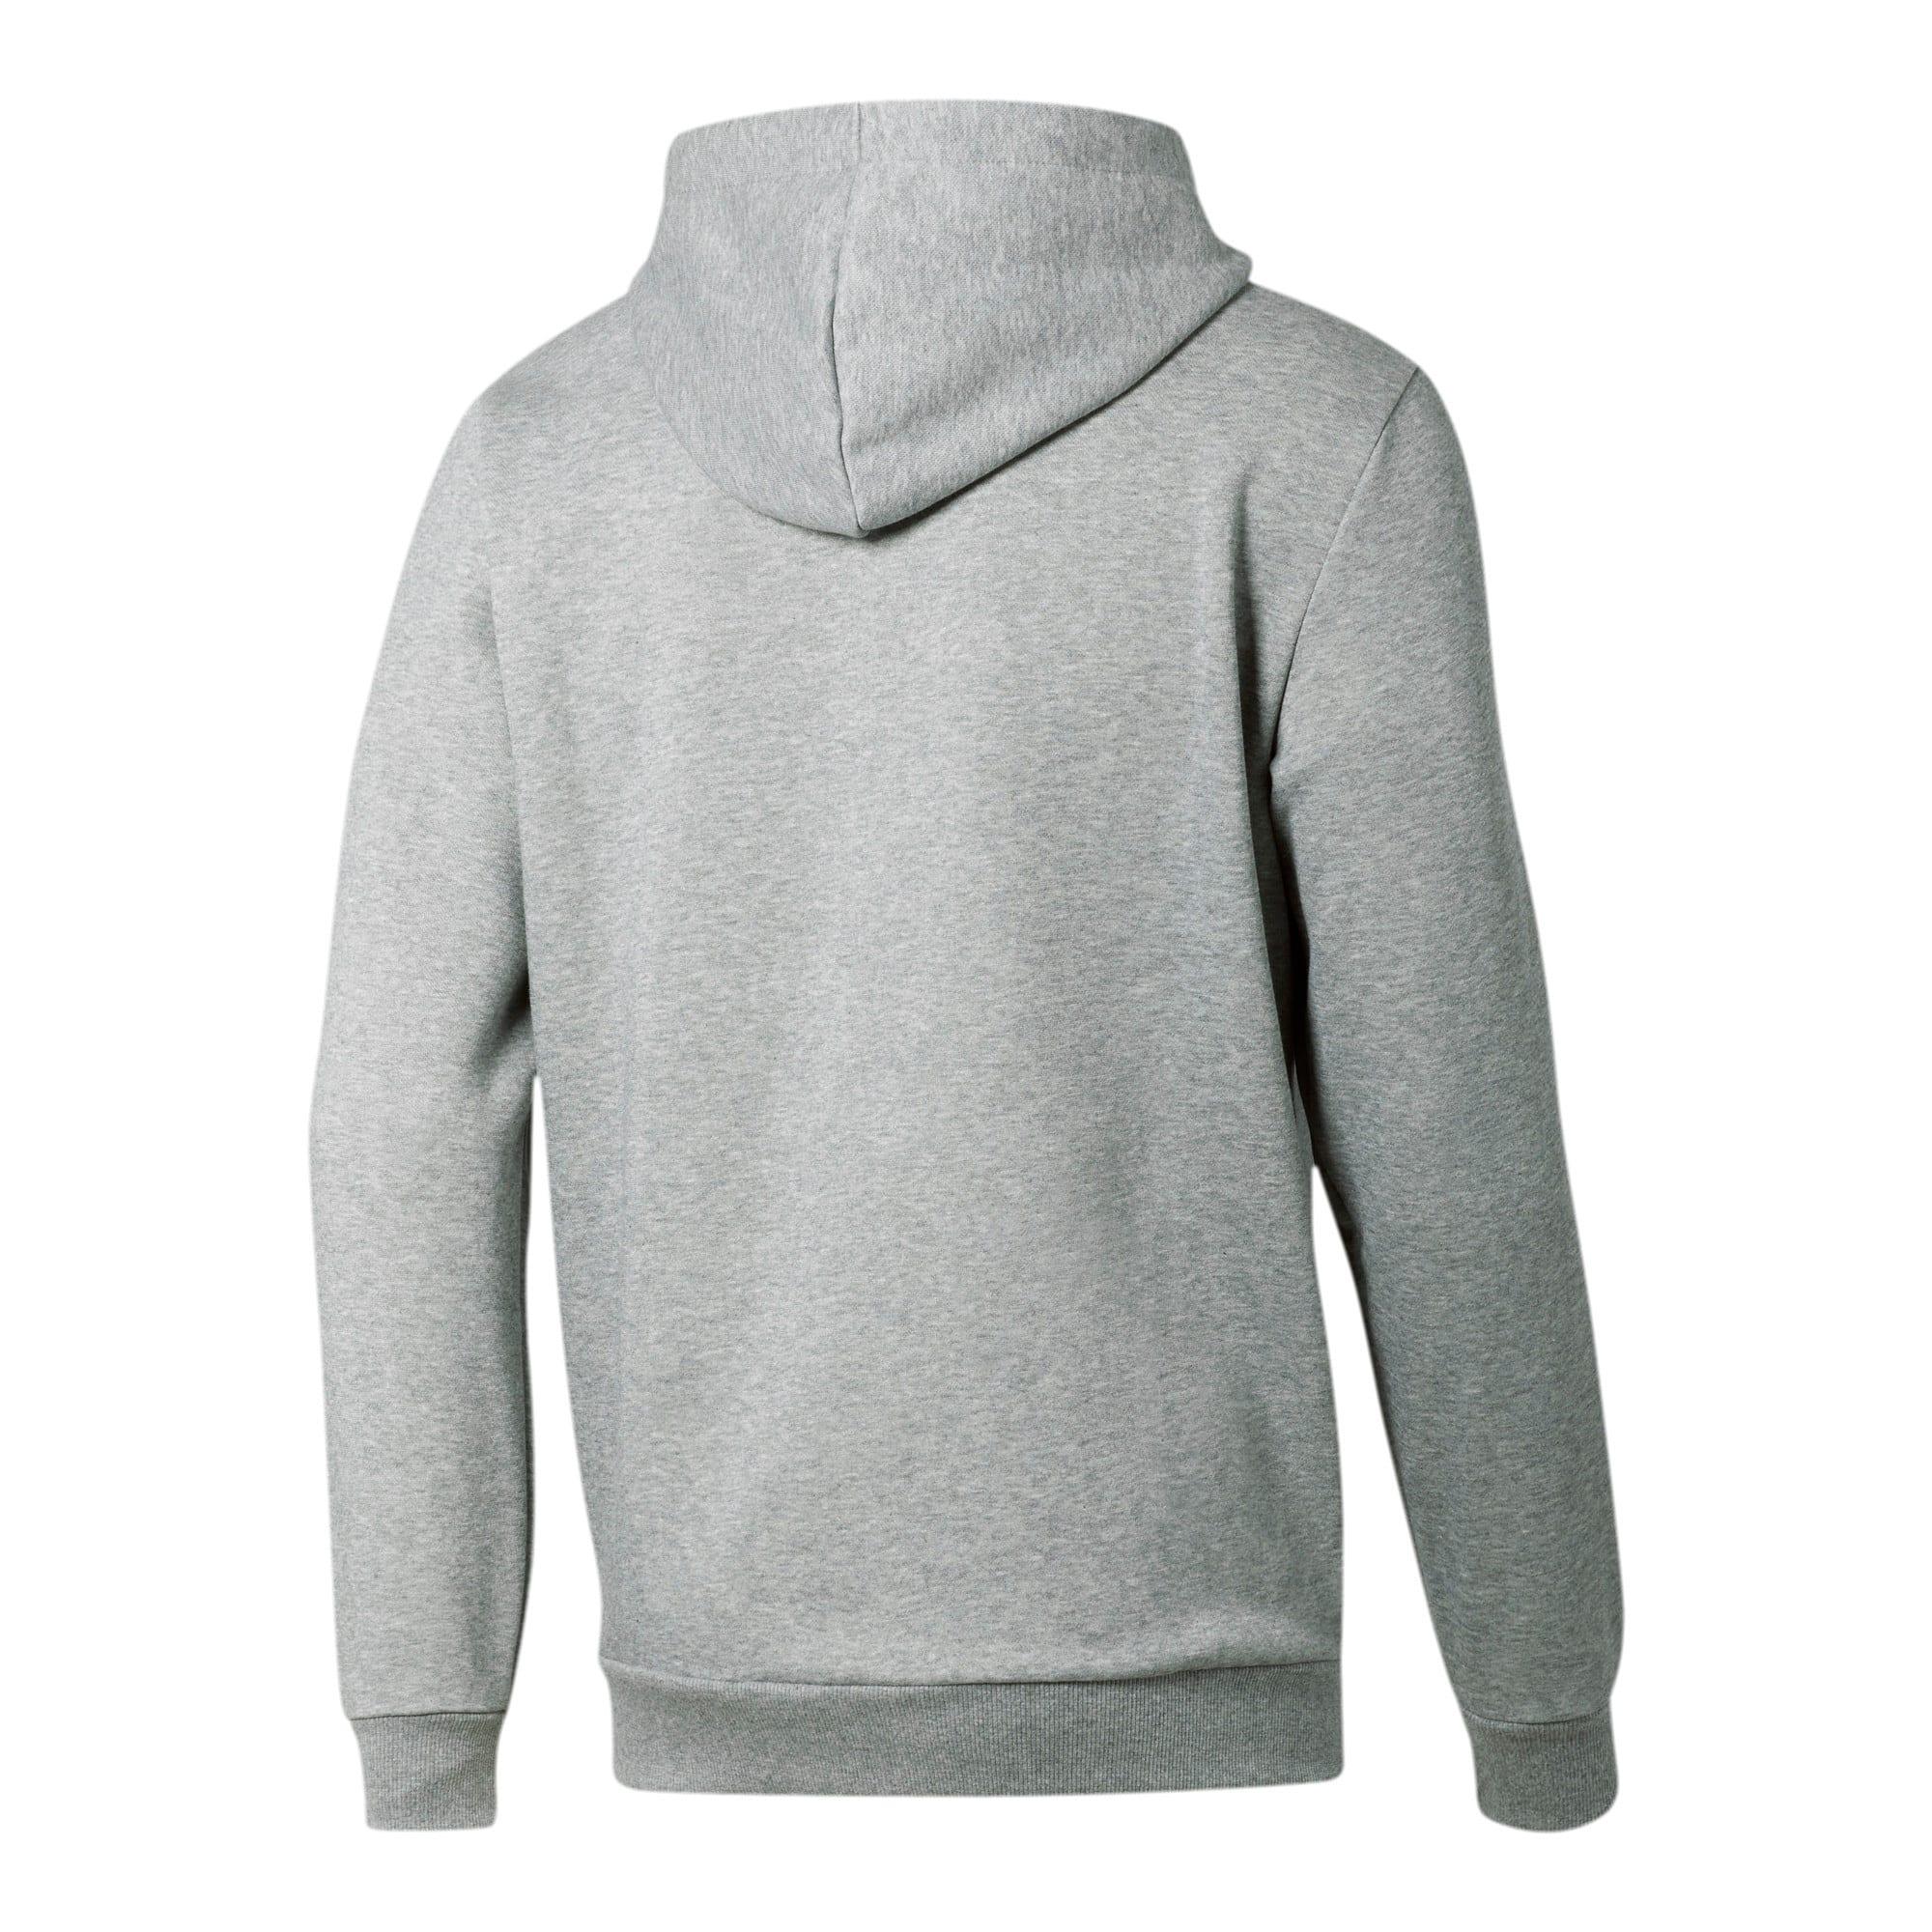 Thumbnail 3 of Essentials Men's Hooded Fleece Jacket, Medium Gray Heather, medium